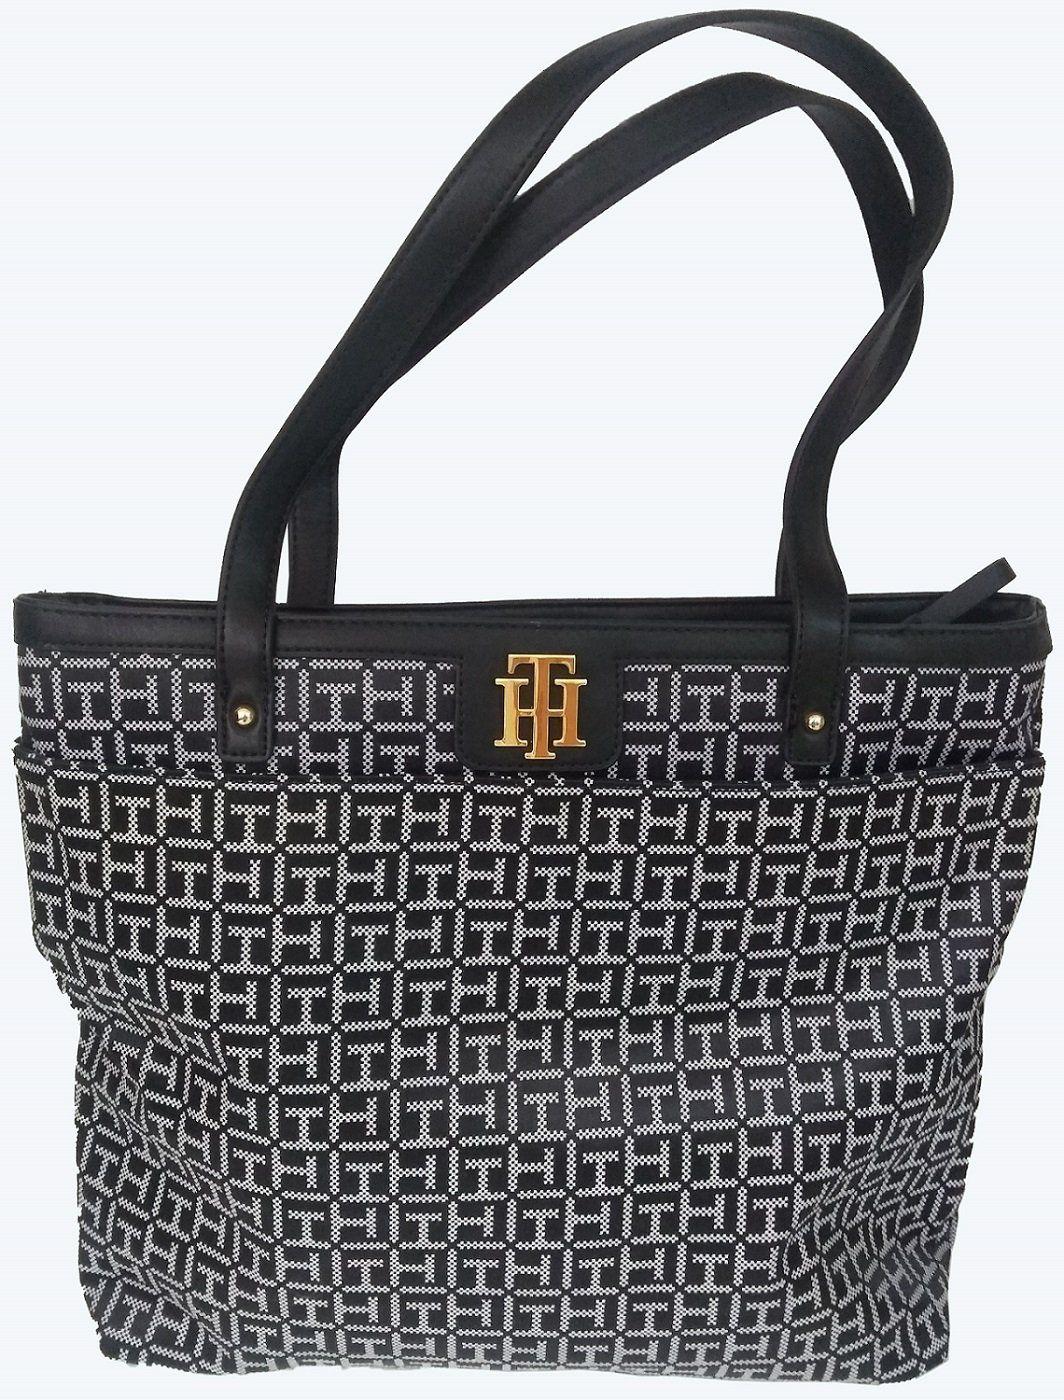 53f743e0f Bolsa Feminina Tommy Hilfiger Preta e Branca Original Importada ...